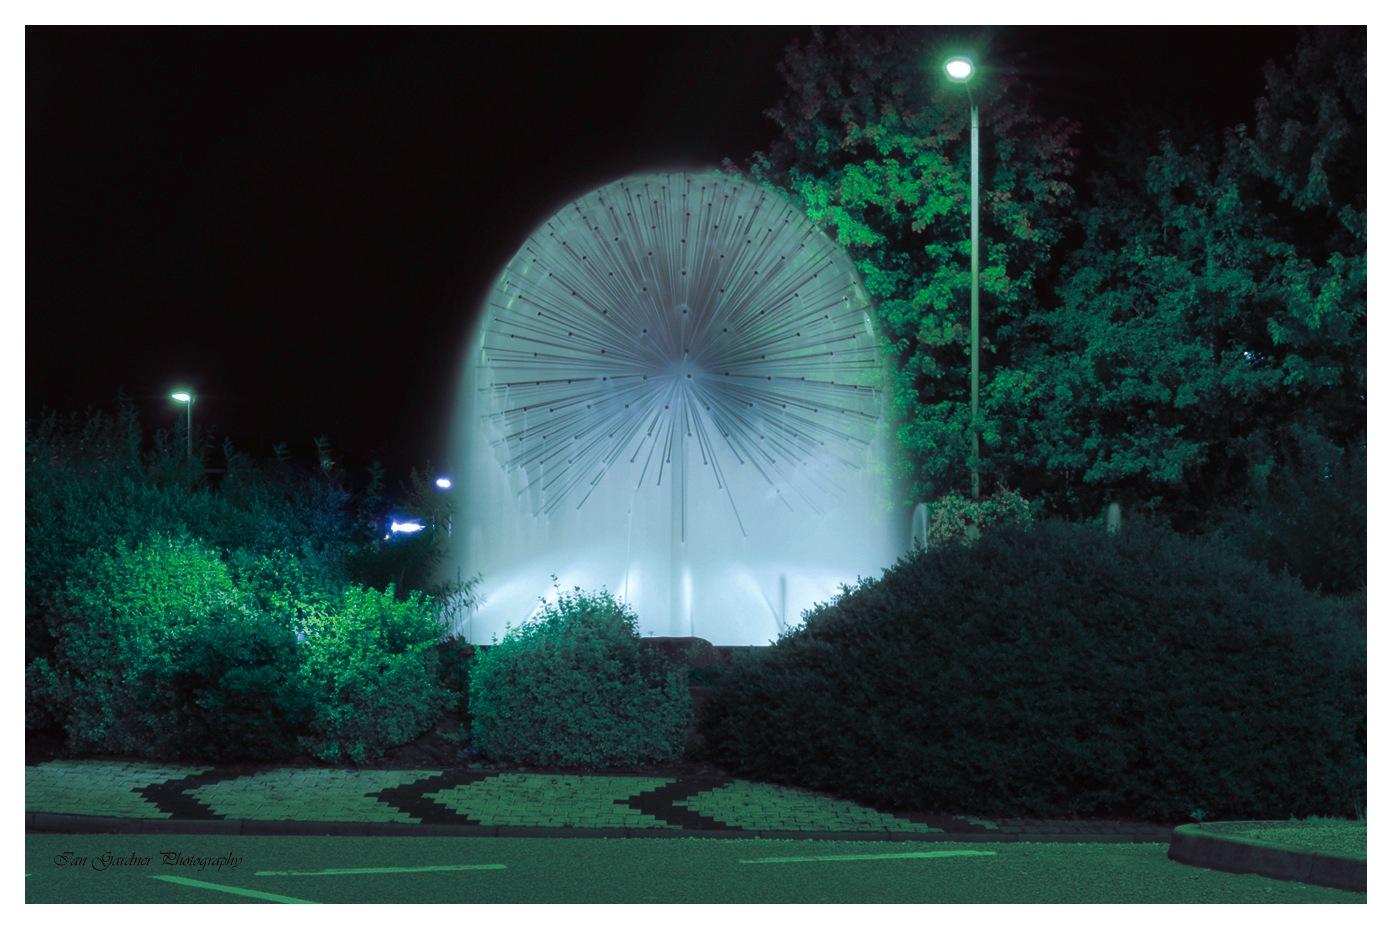 The Dandelion Fountain By Night by Ian Gardner